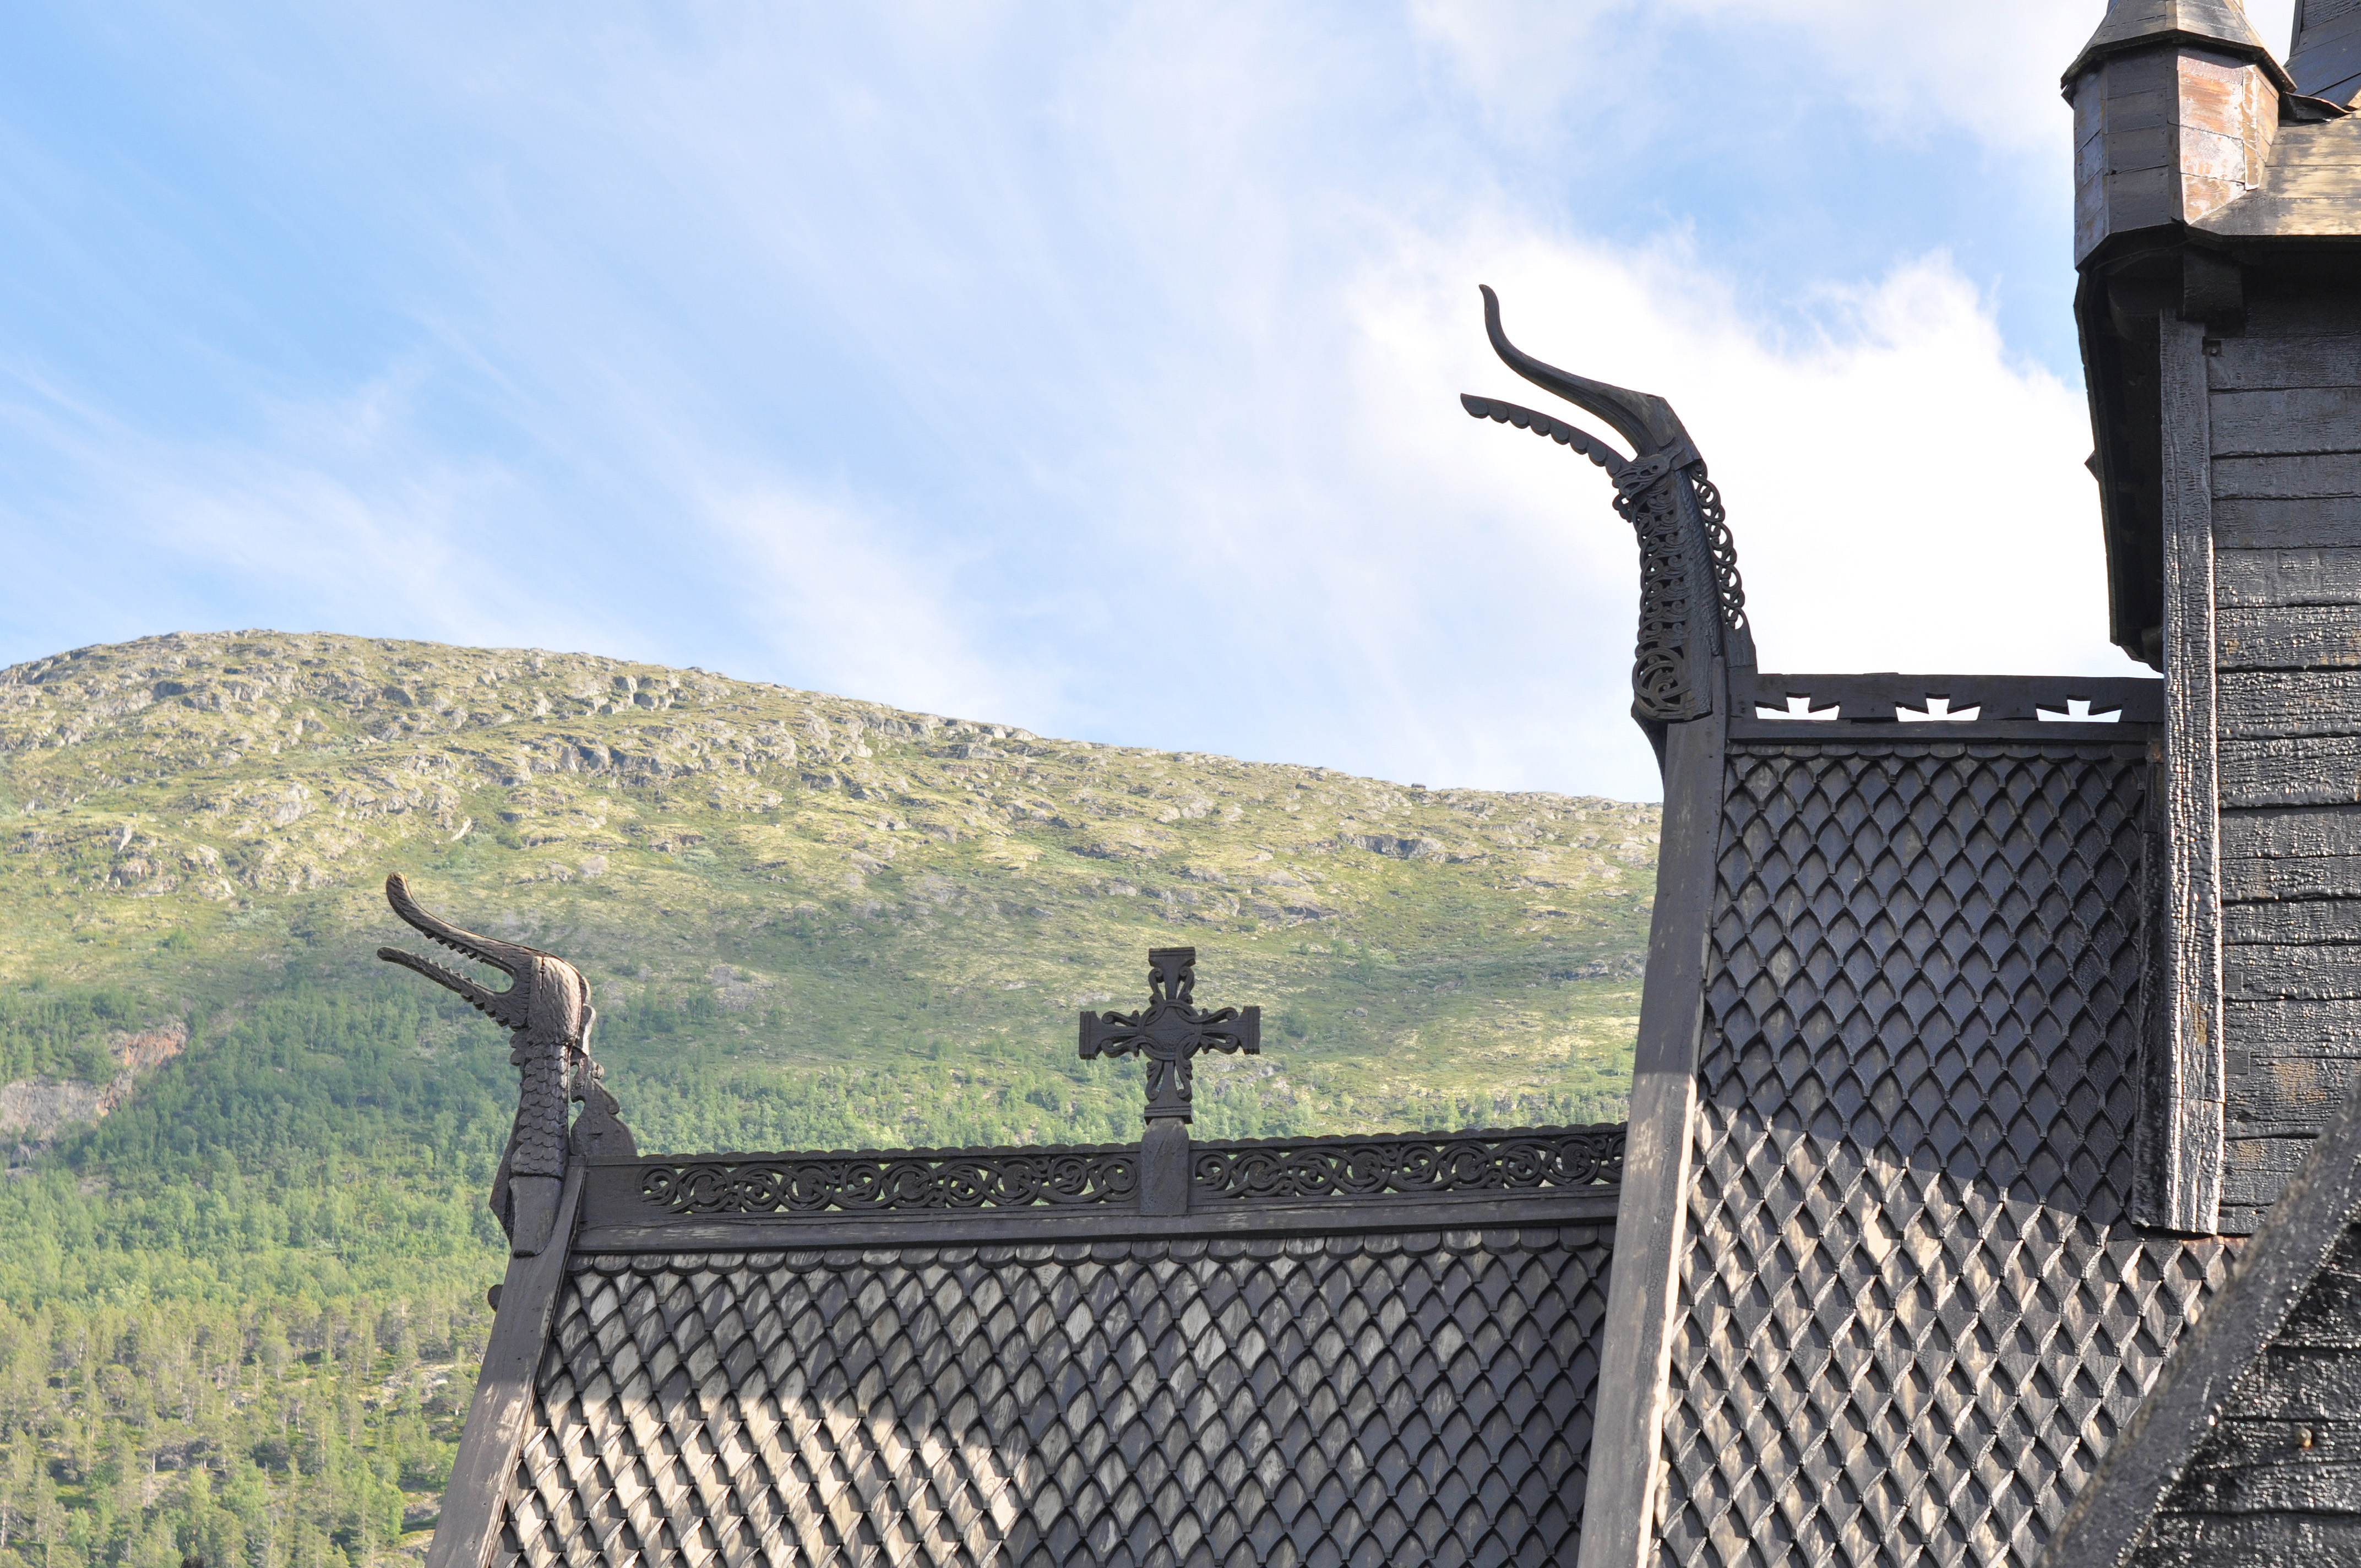 File:Stave church Lom, dragon heads.jpg - Wikimedia Commons